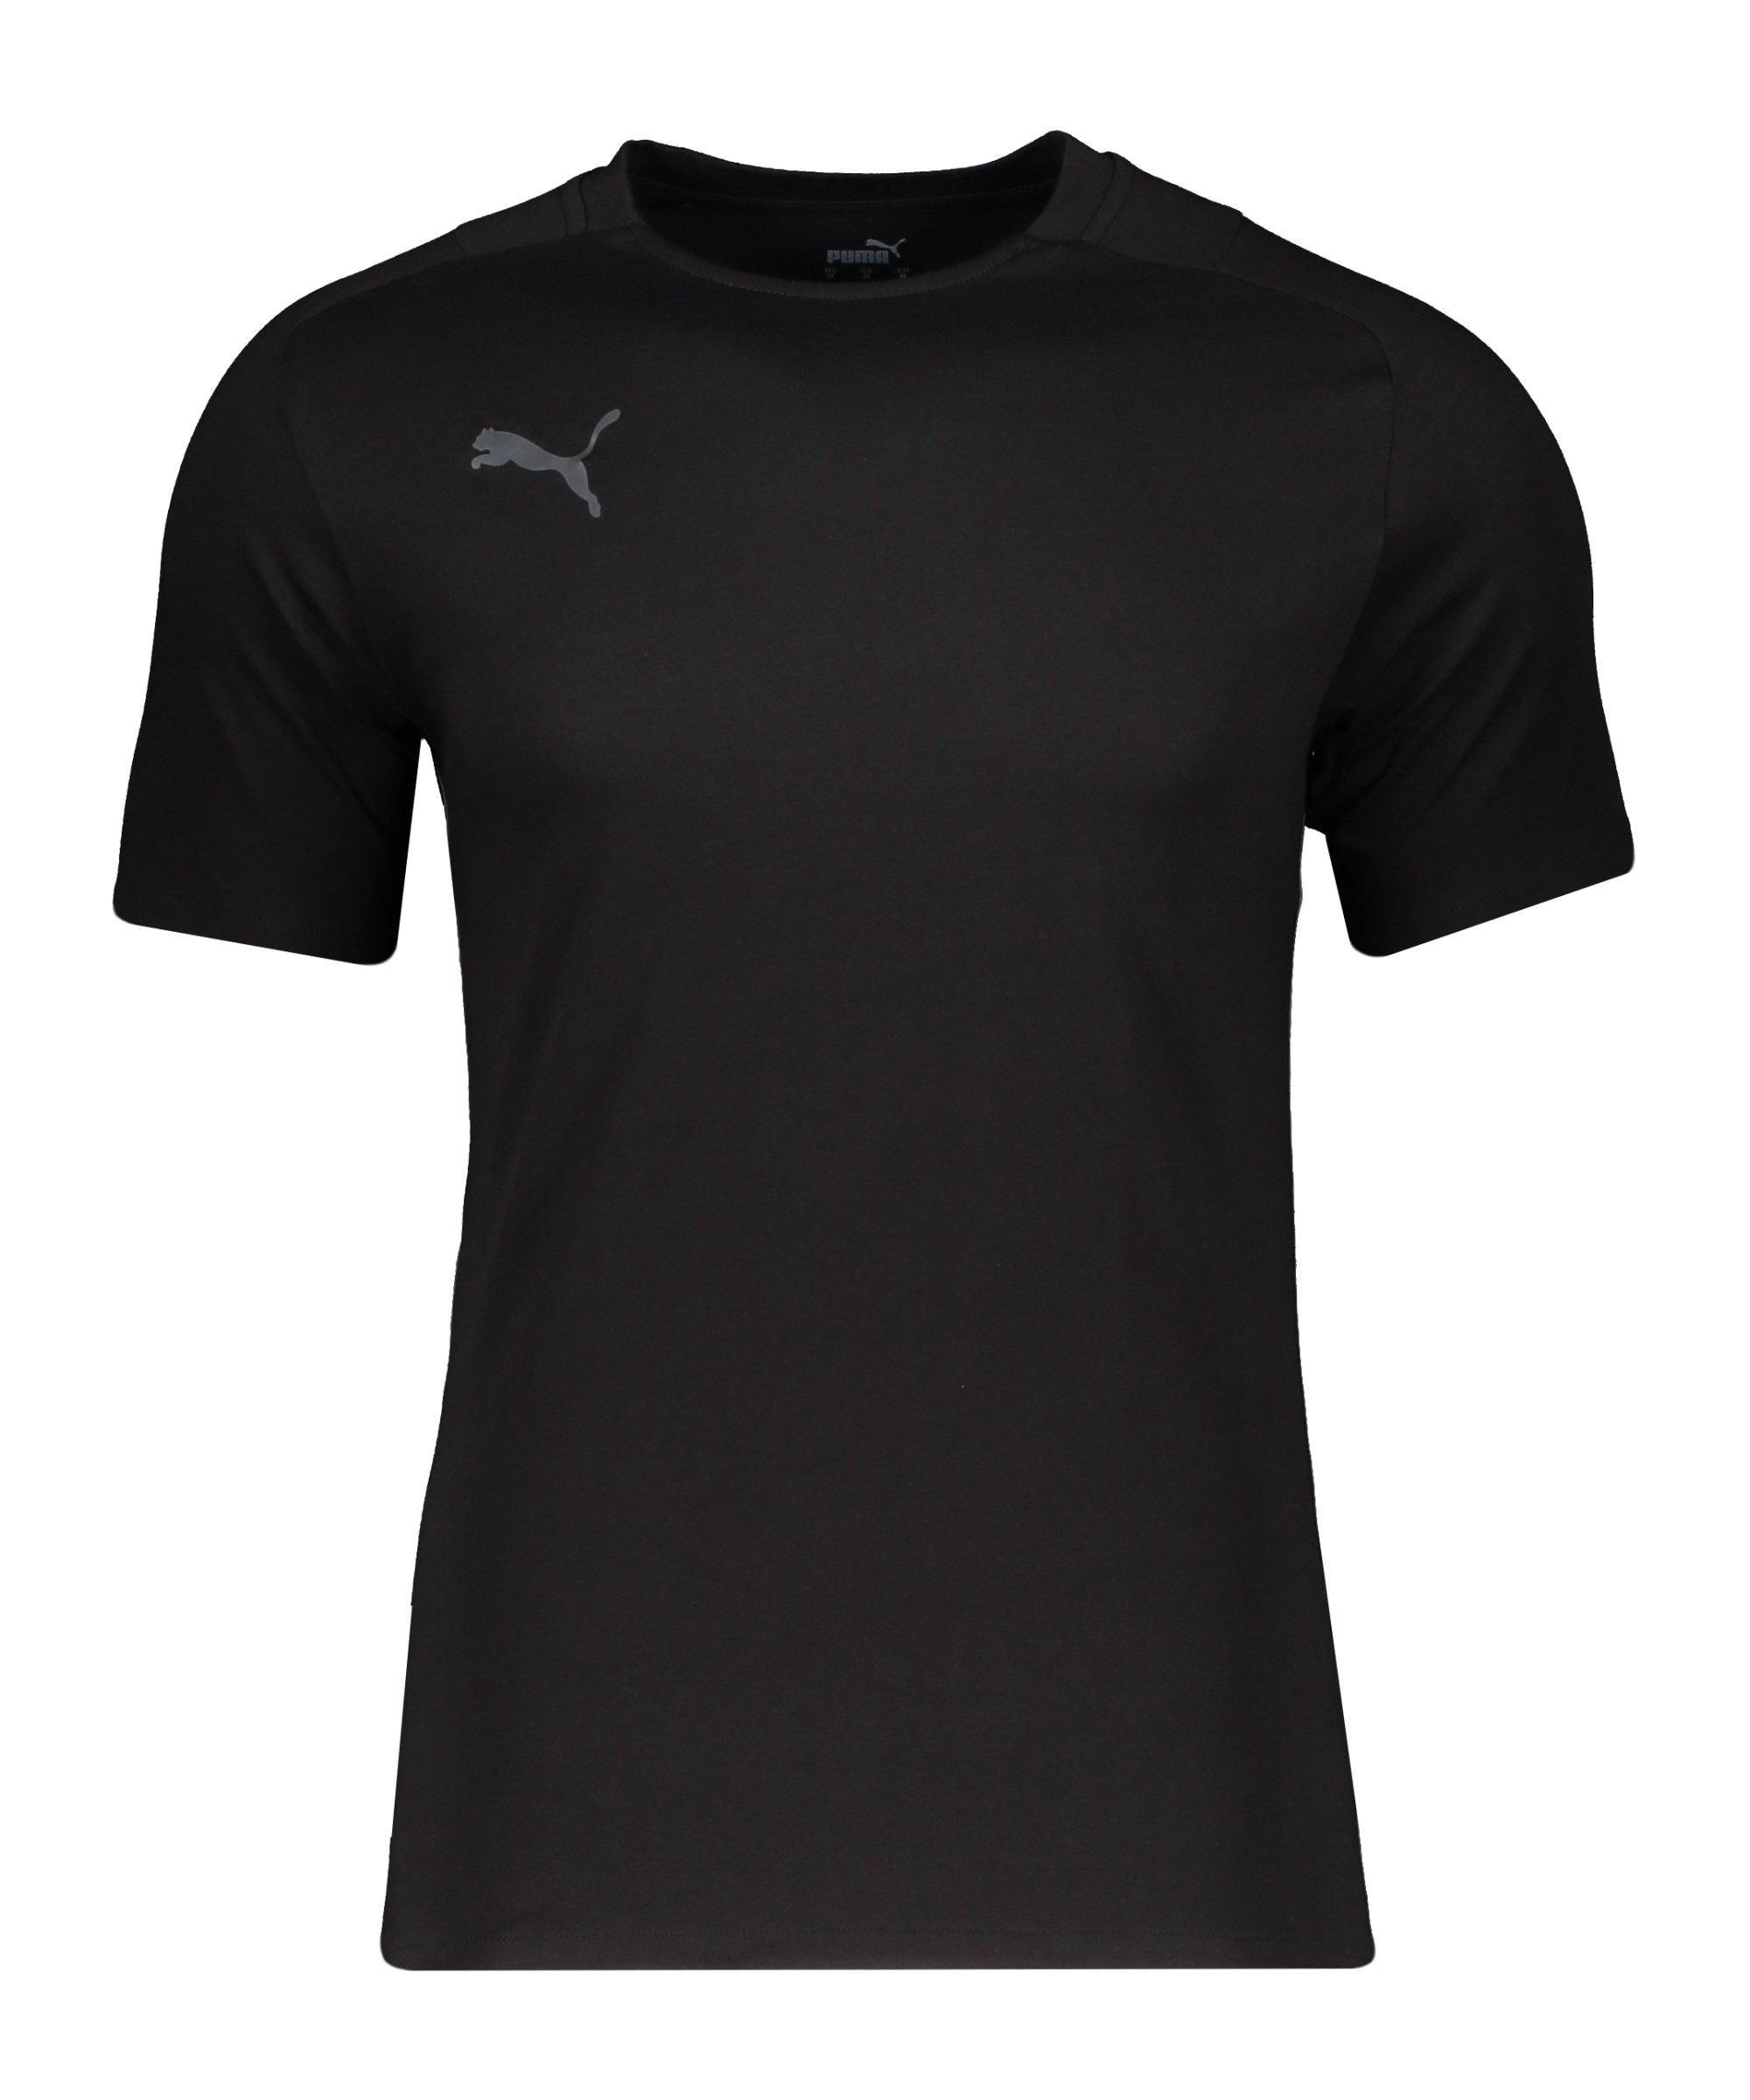 PUMA teamCUP Casuals T-Shirt Schwarz Grau F03 - schwarz